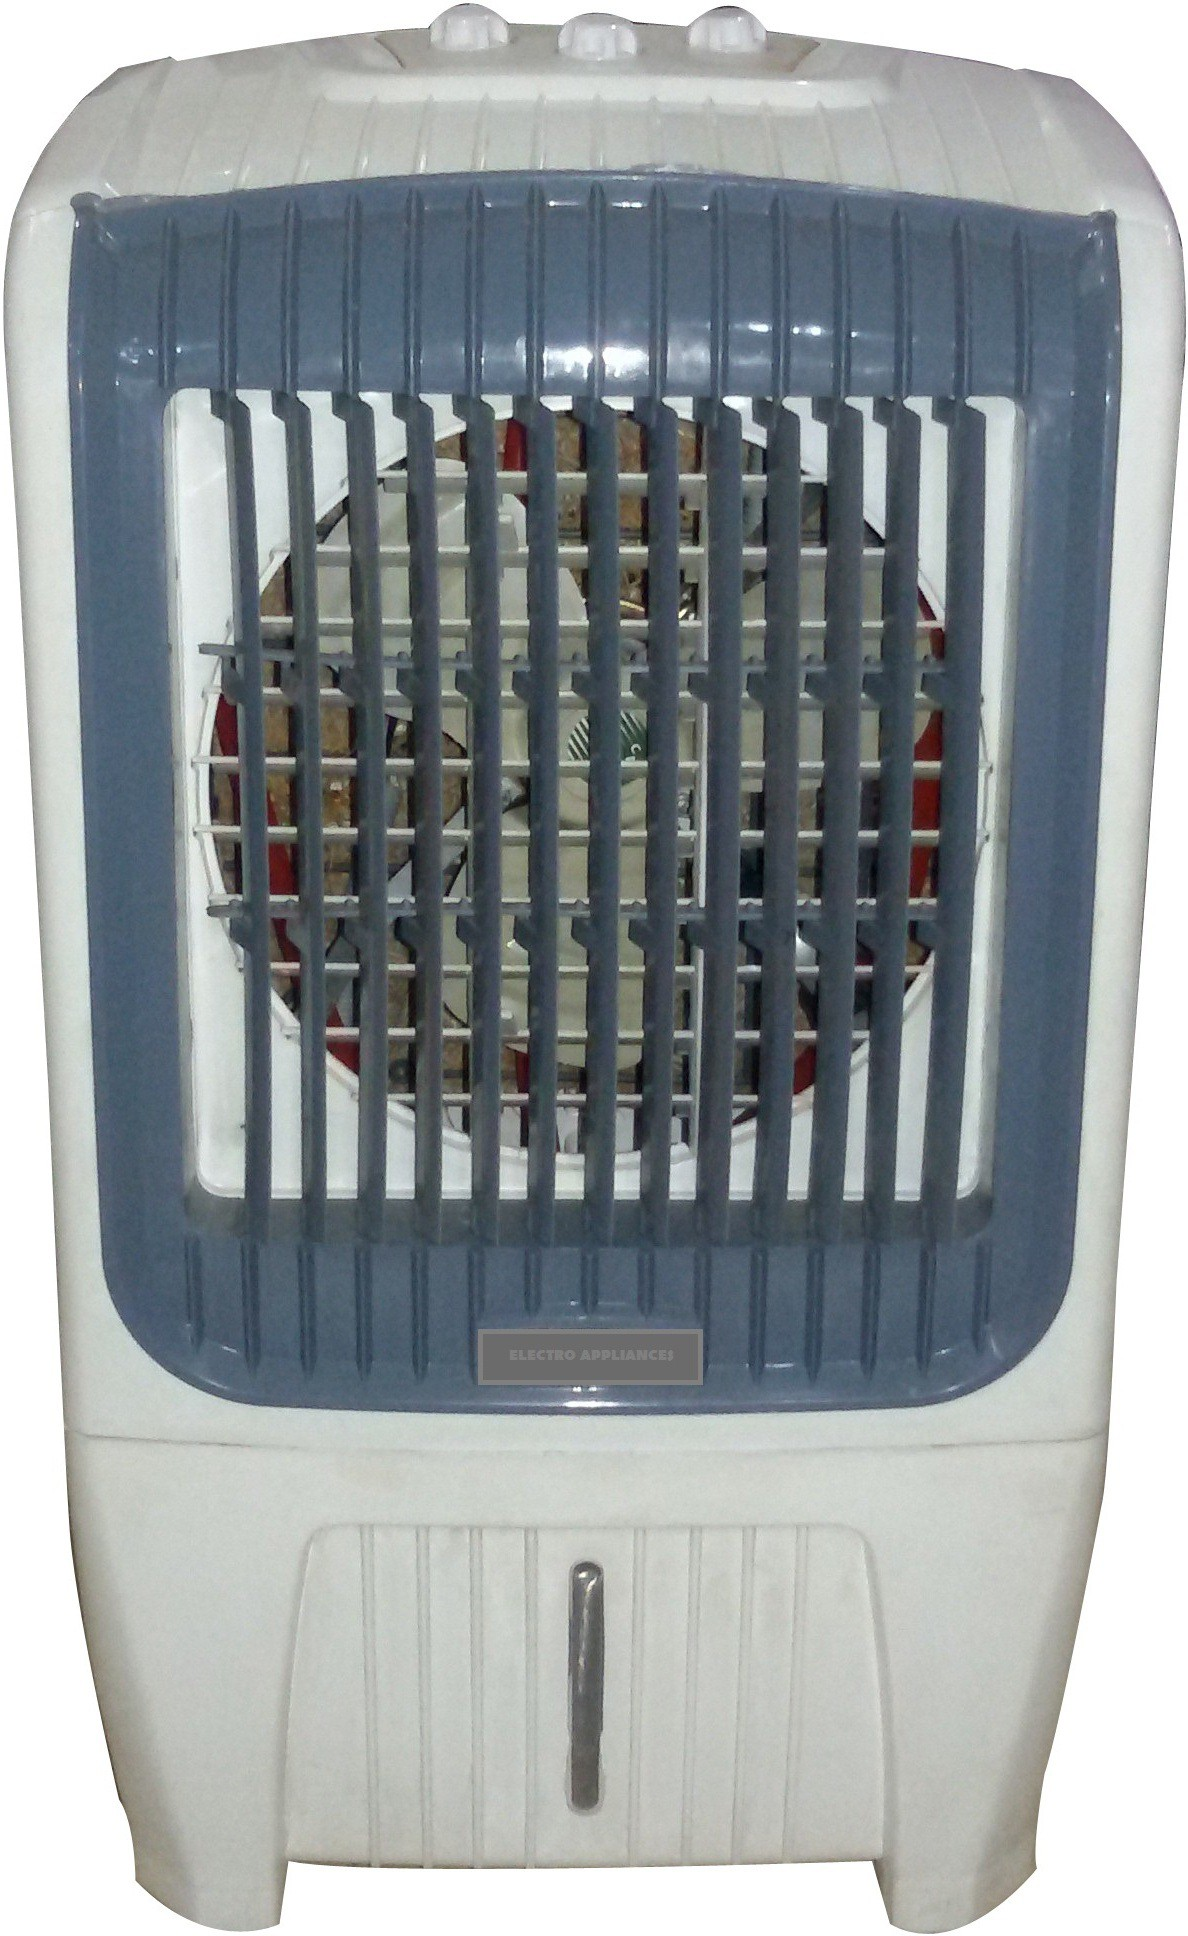 View jk electro appliances jkrc09 Personal Air Cooler  Price Online